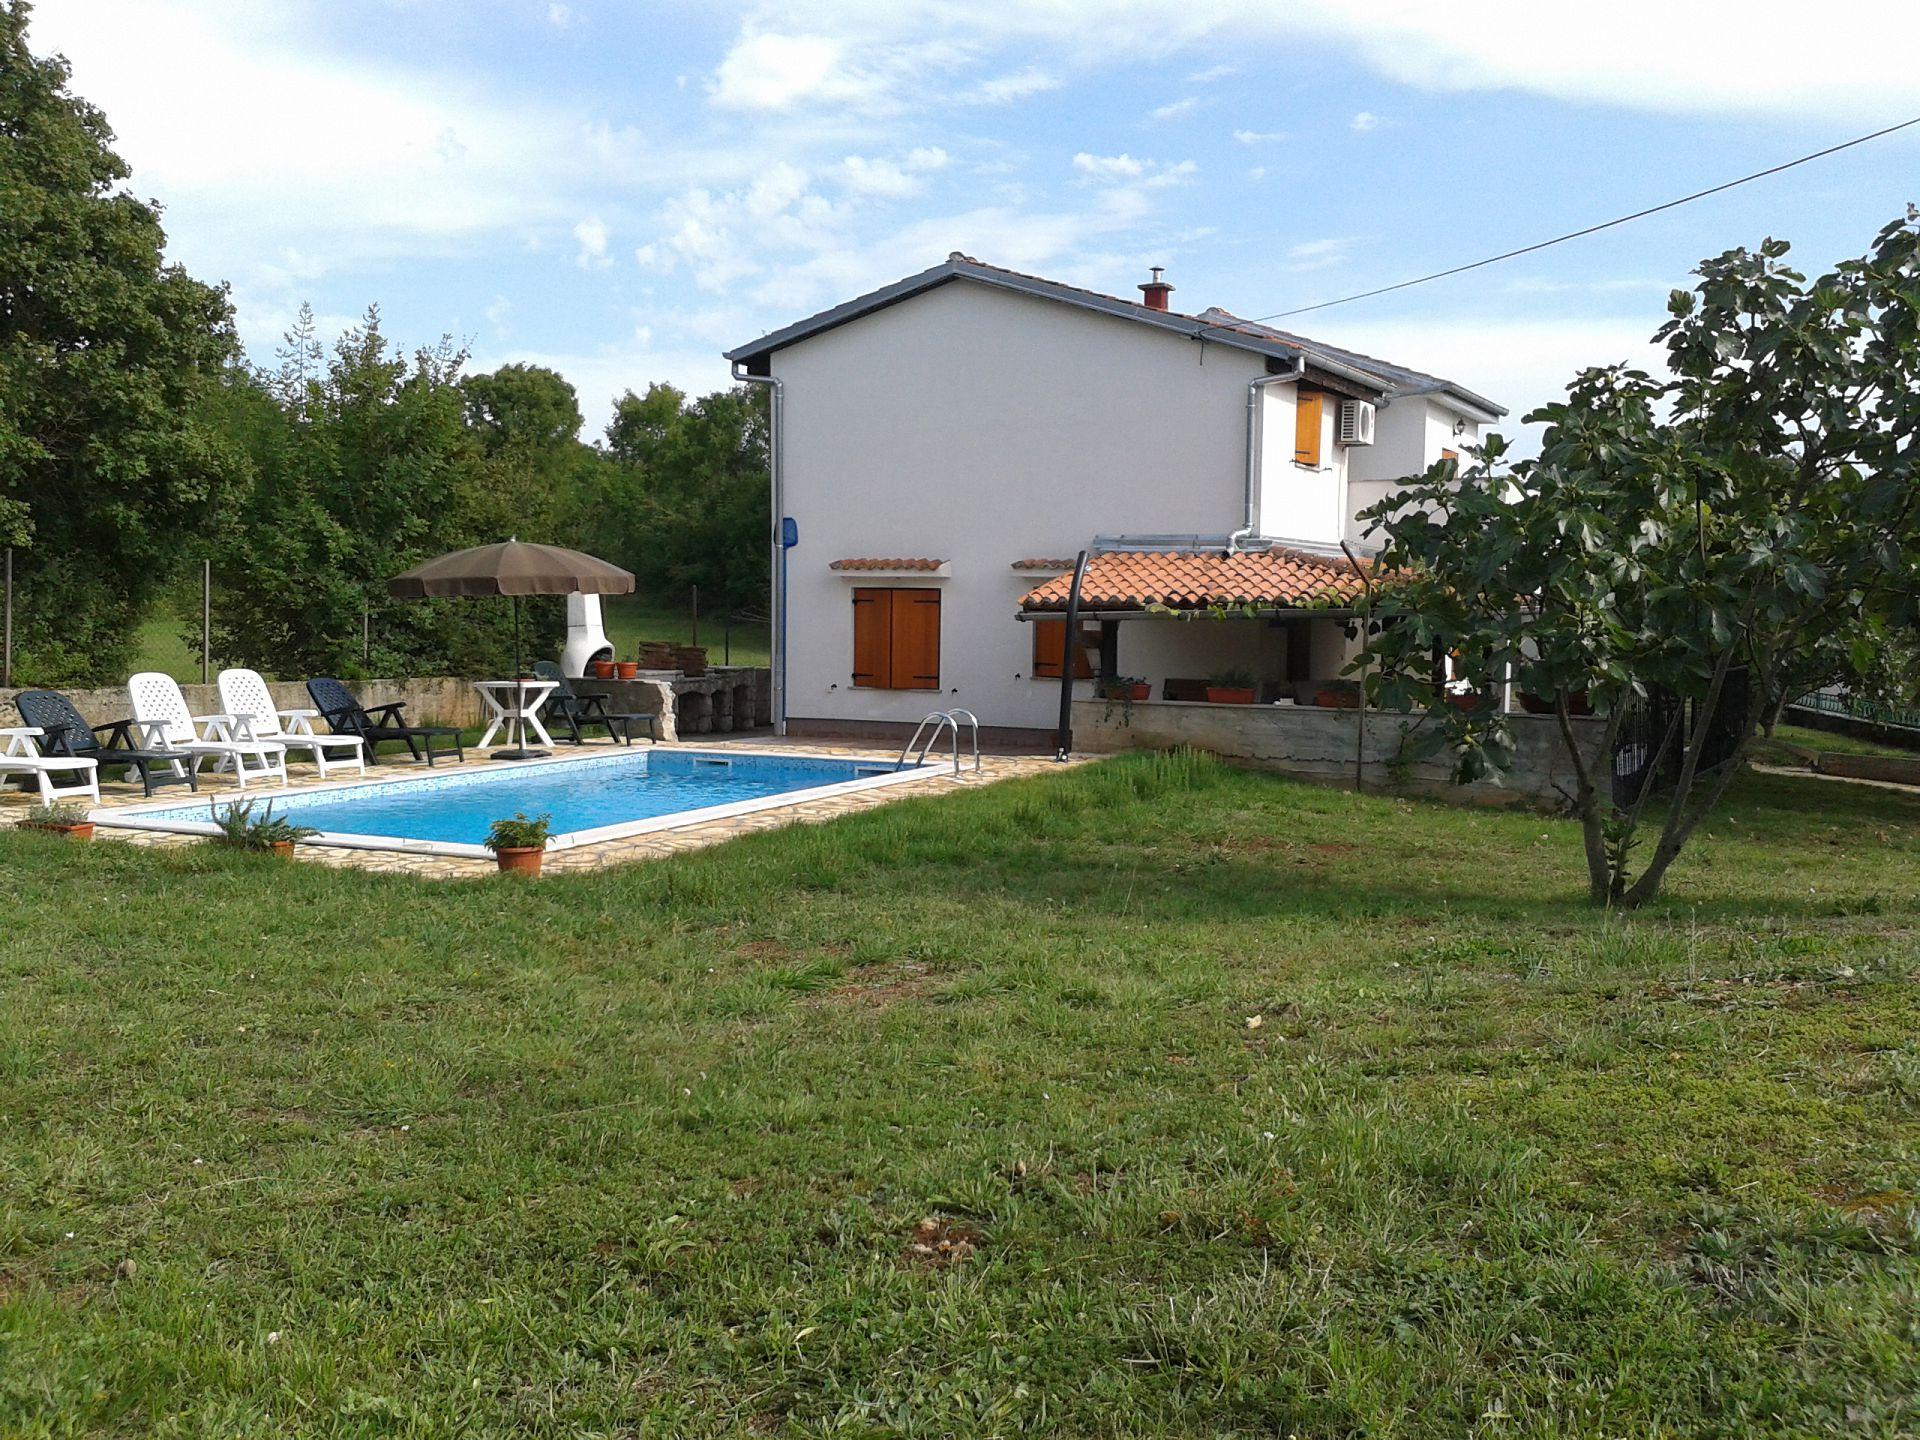 36101  - Bajcic - Ferienhäuser, Villen Kroatien